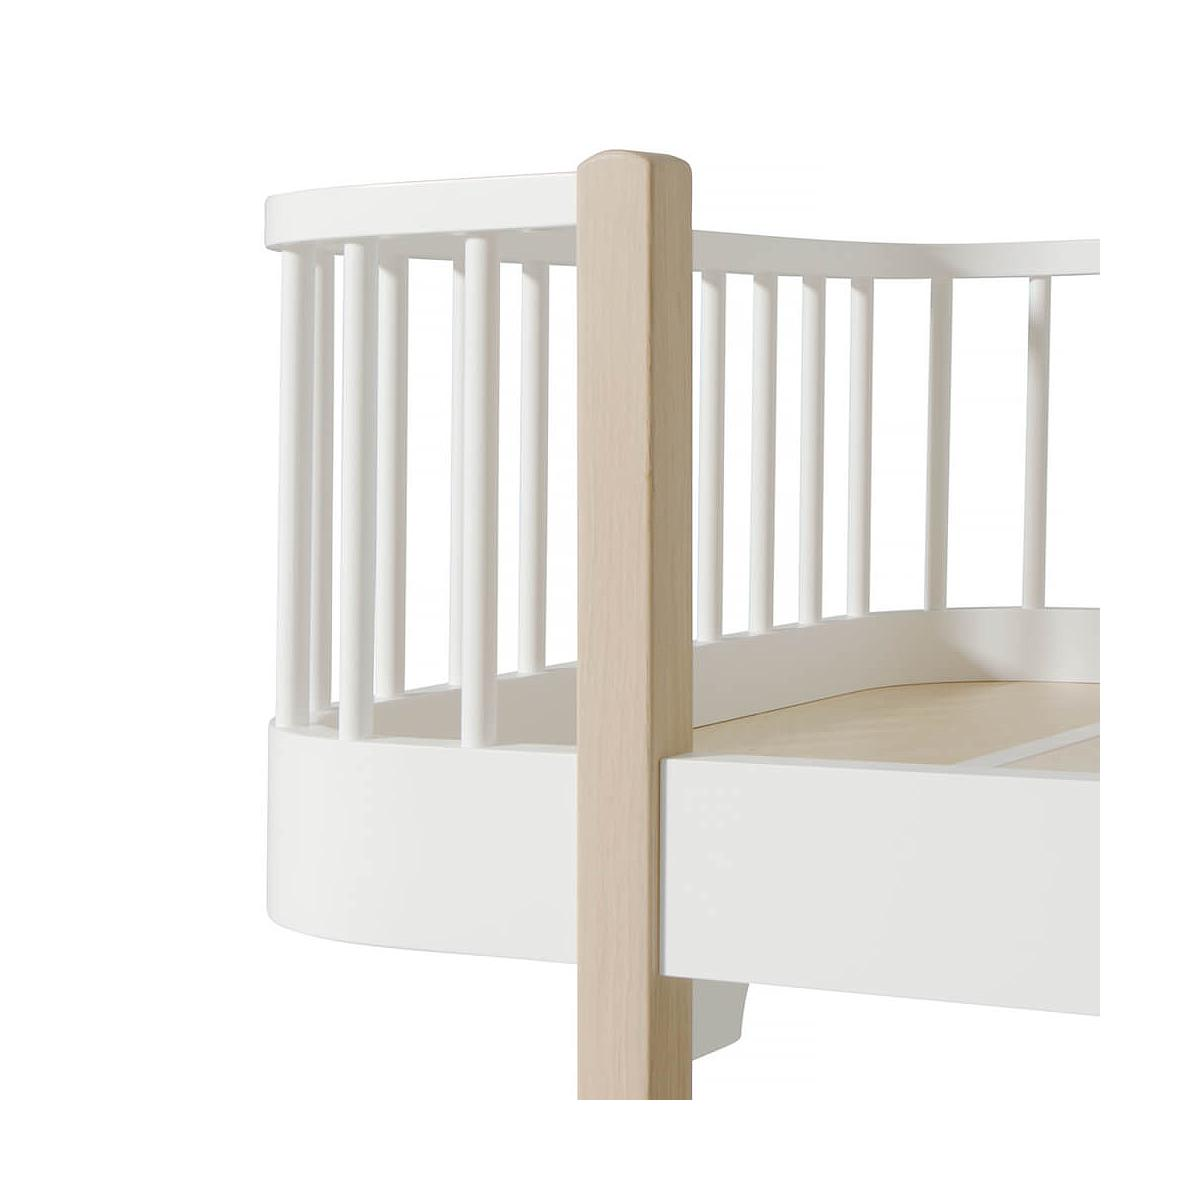 Lit banquette évolutif 90x200cm WOOD ORIGINAL Oliver Furniture blanc-chêne